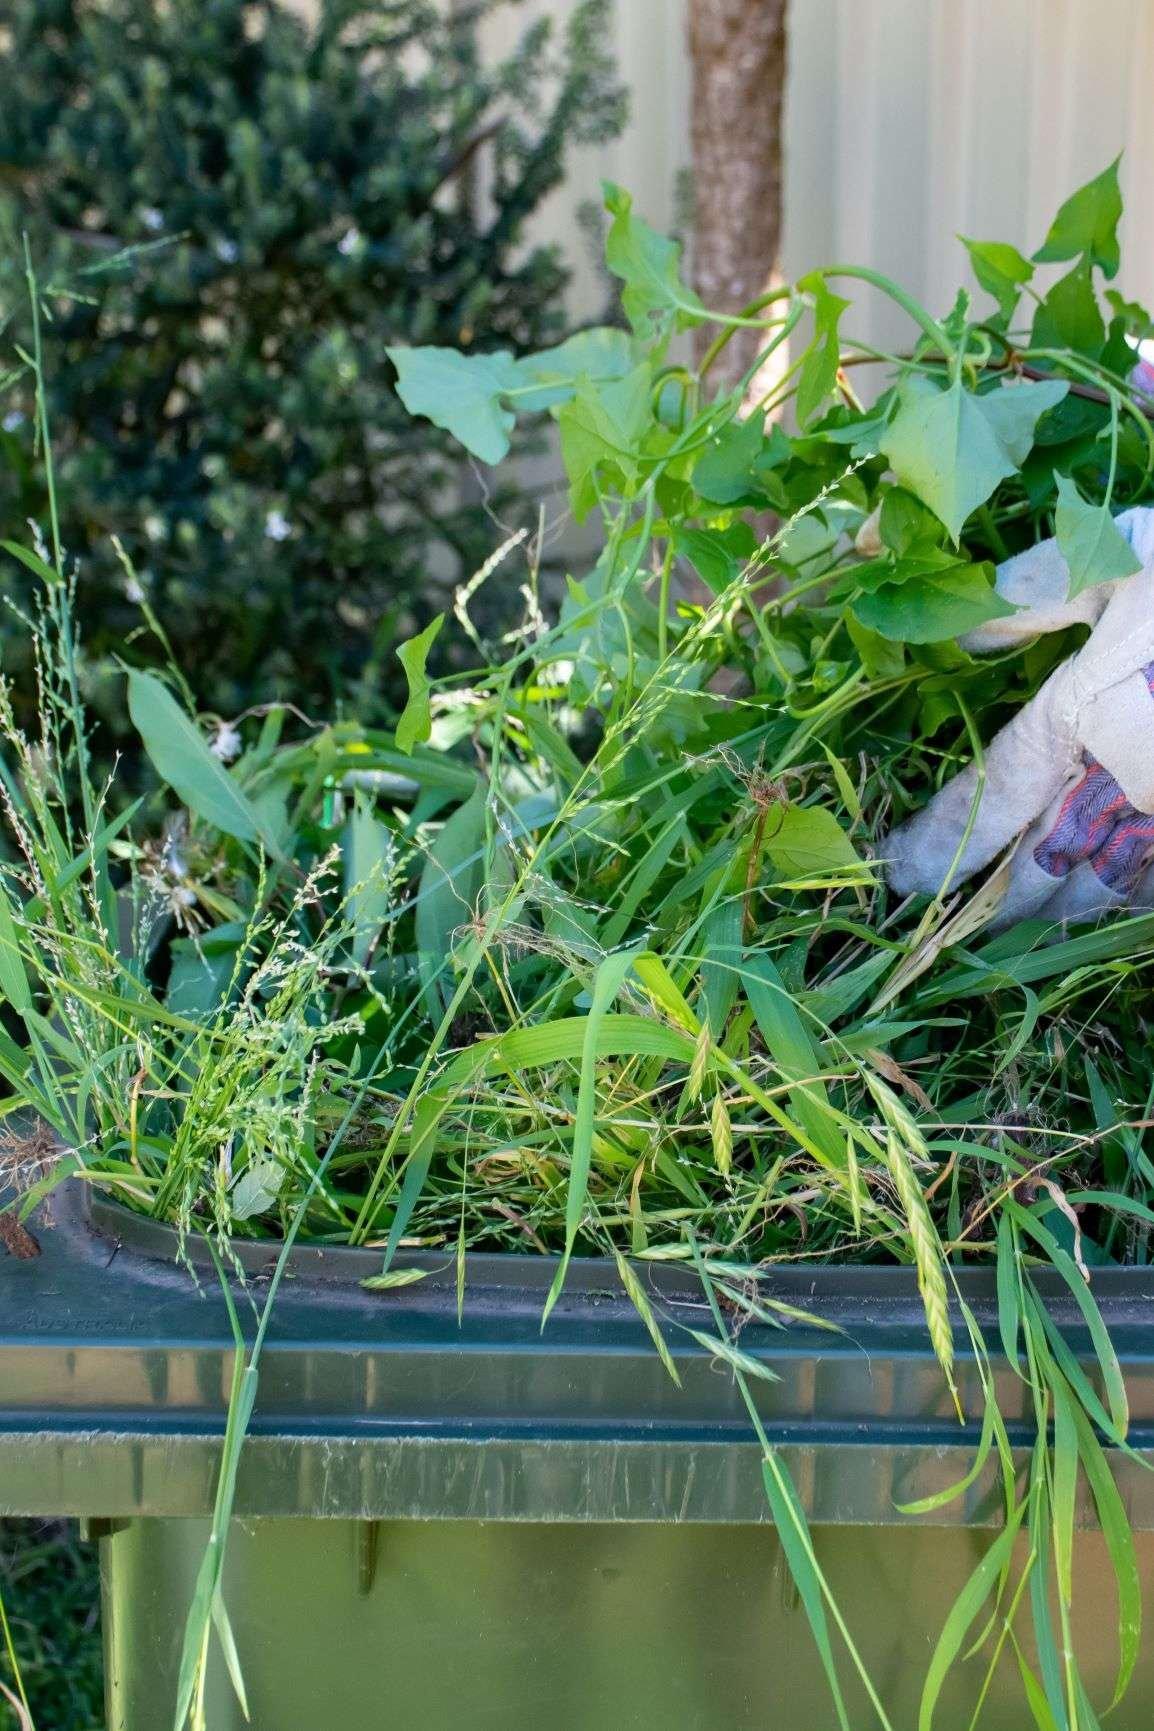 Garden Waste in Green Bin